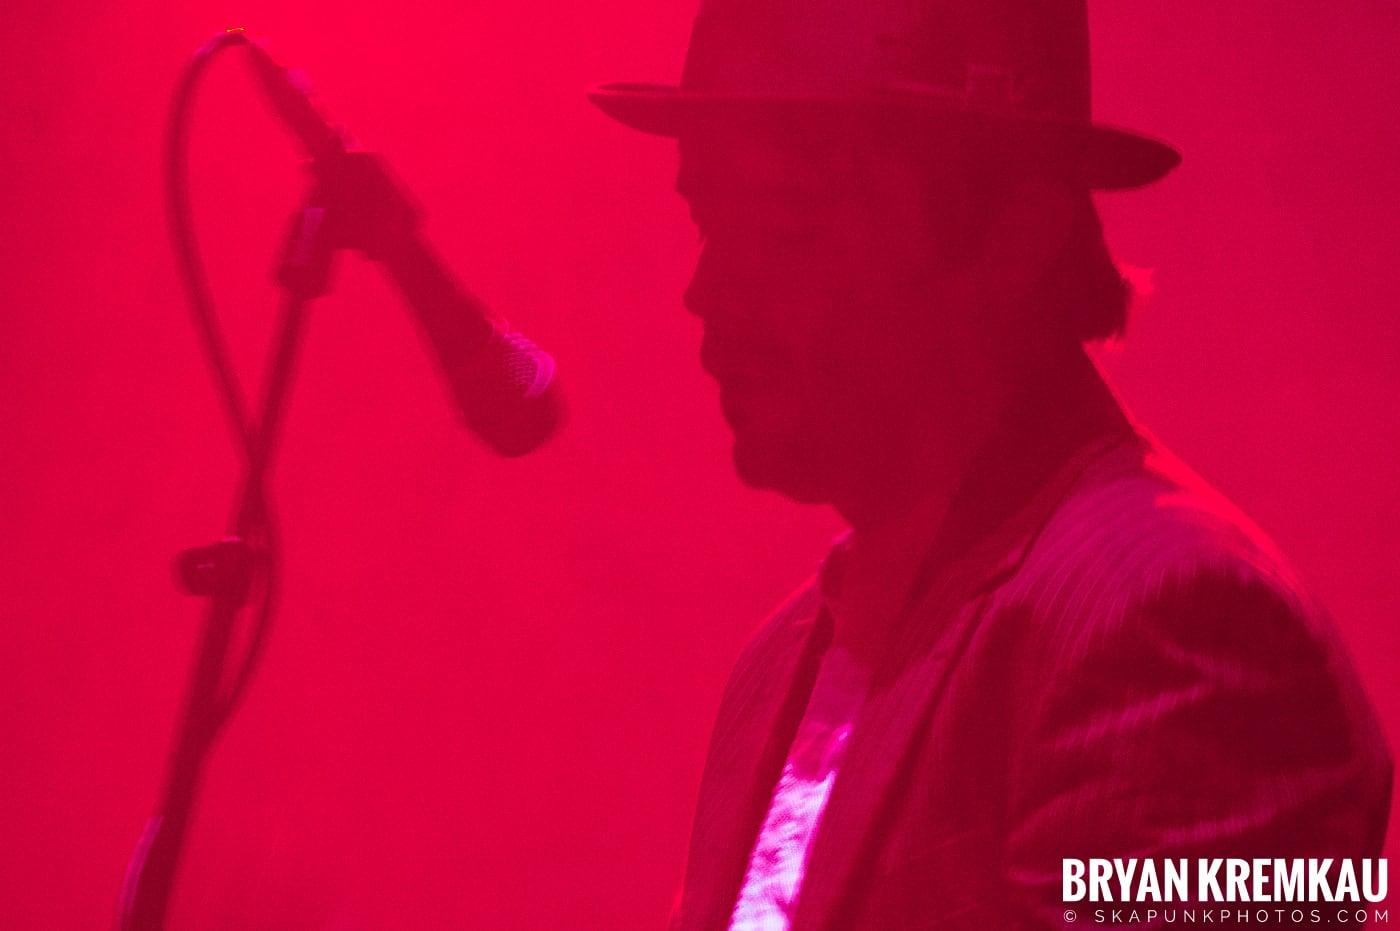 The Pogues @ Brixton Academy, London UK - 12.17.06 (5)